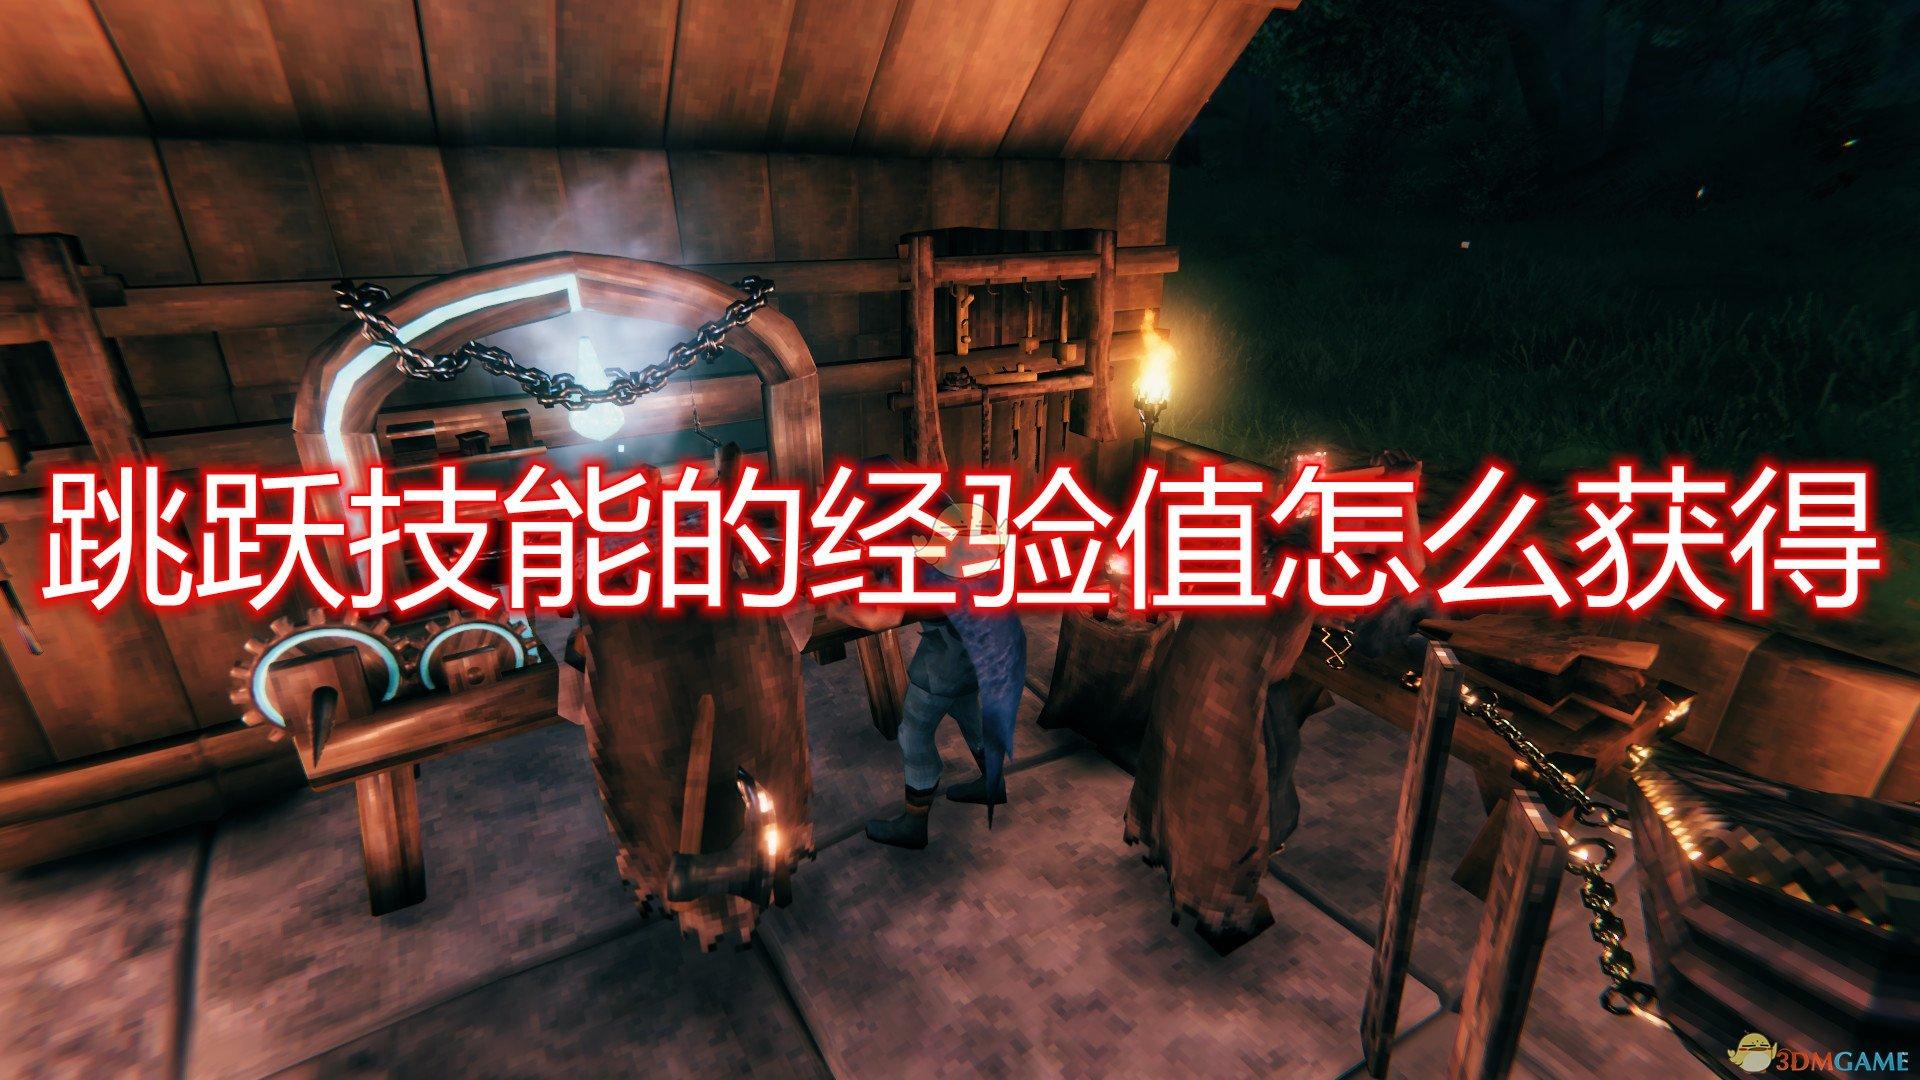 《Valheim:英靈神殿》跳躍技能經驗值獲取機制介紹